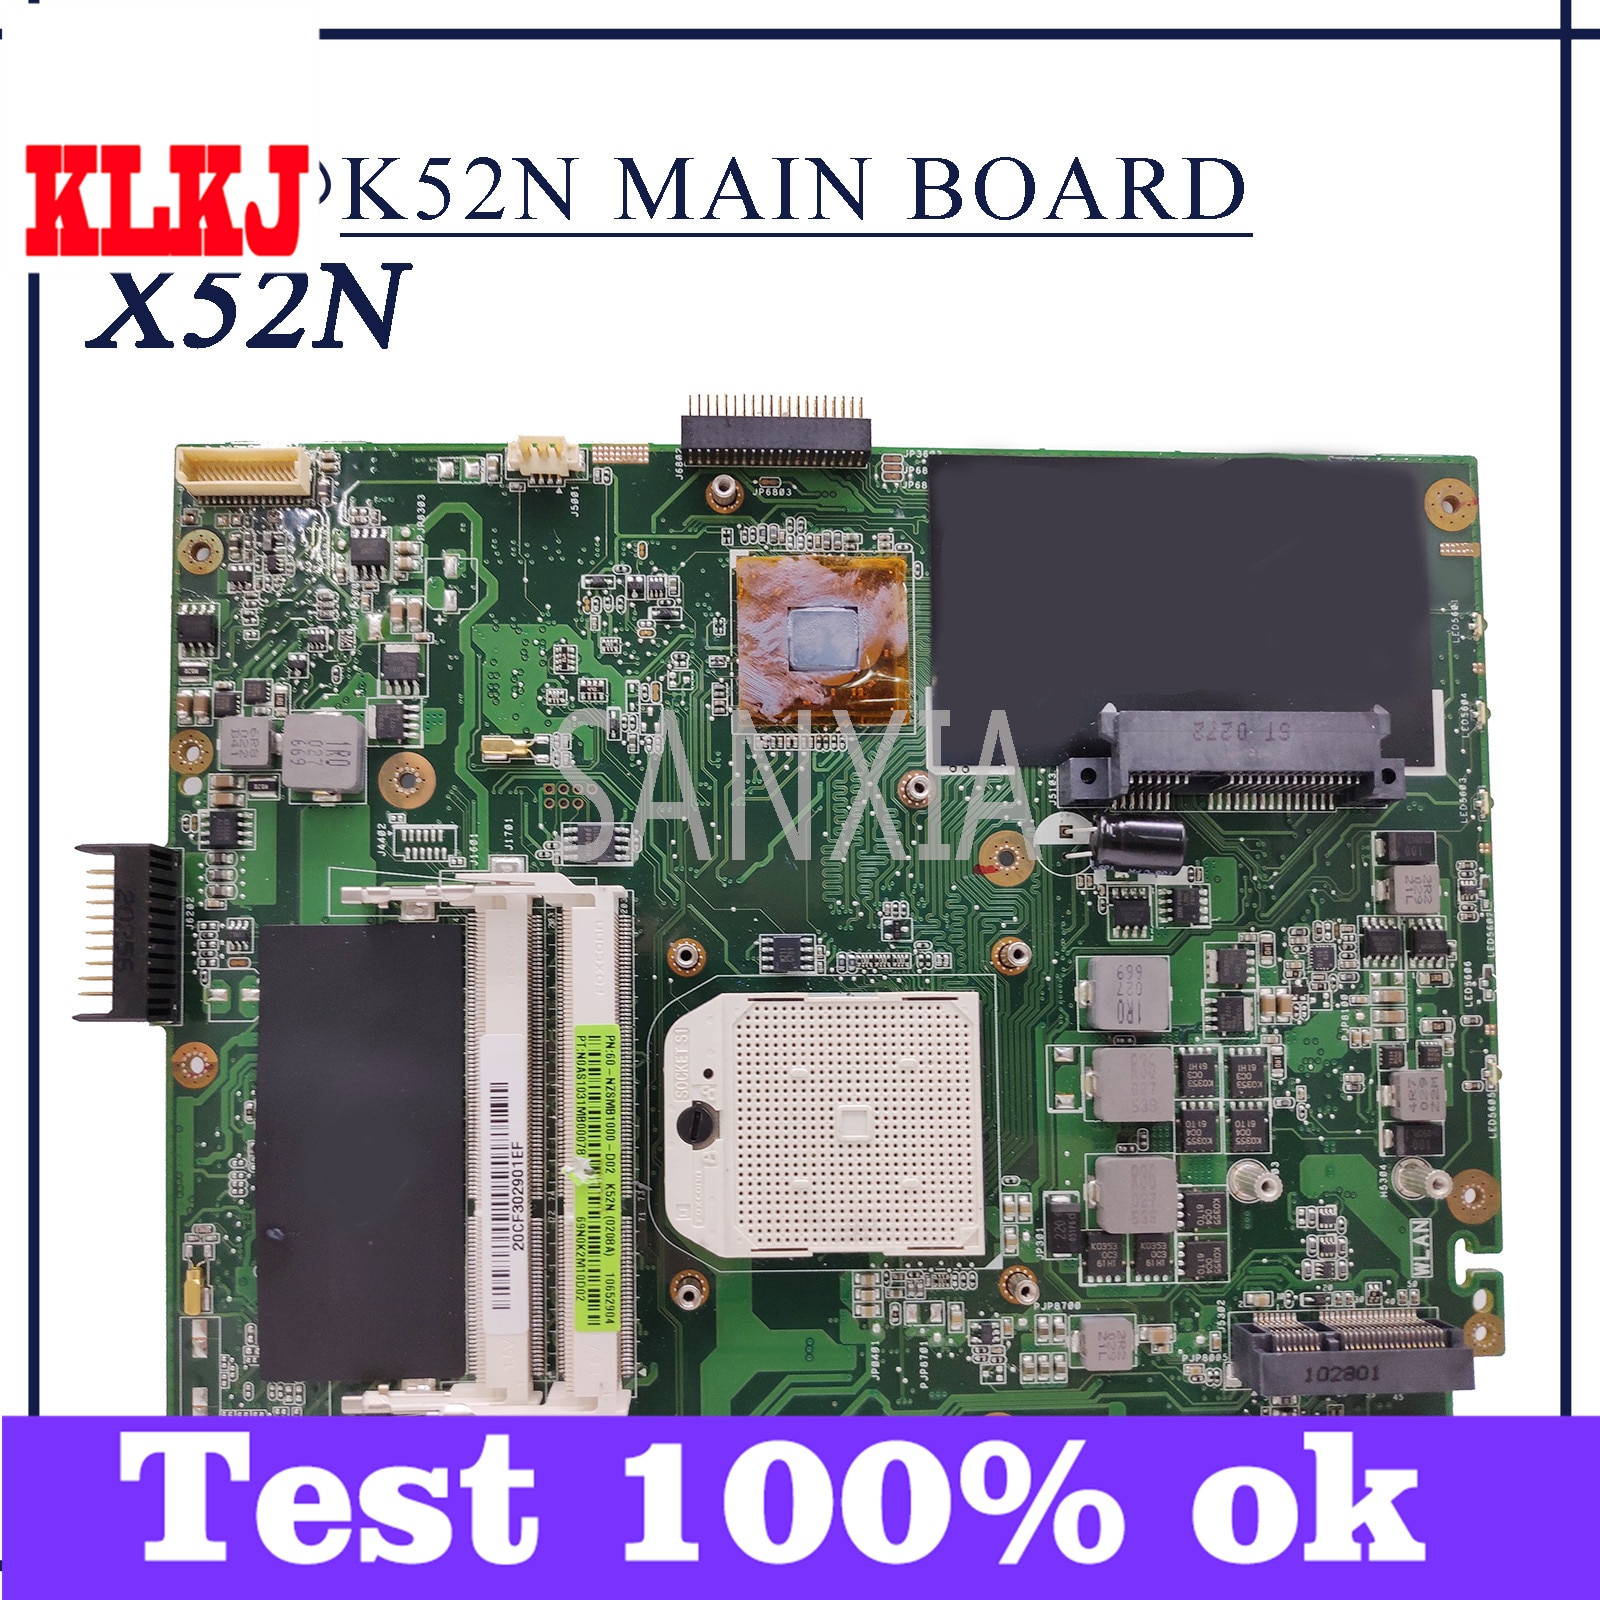 KLKJ K52N اللوحة الأم لأجهزة الكمبيوتر المحمول ASUS X52N A52N اللوحة الرئيسية الأصلية